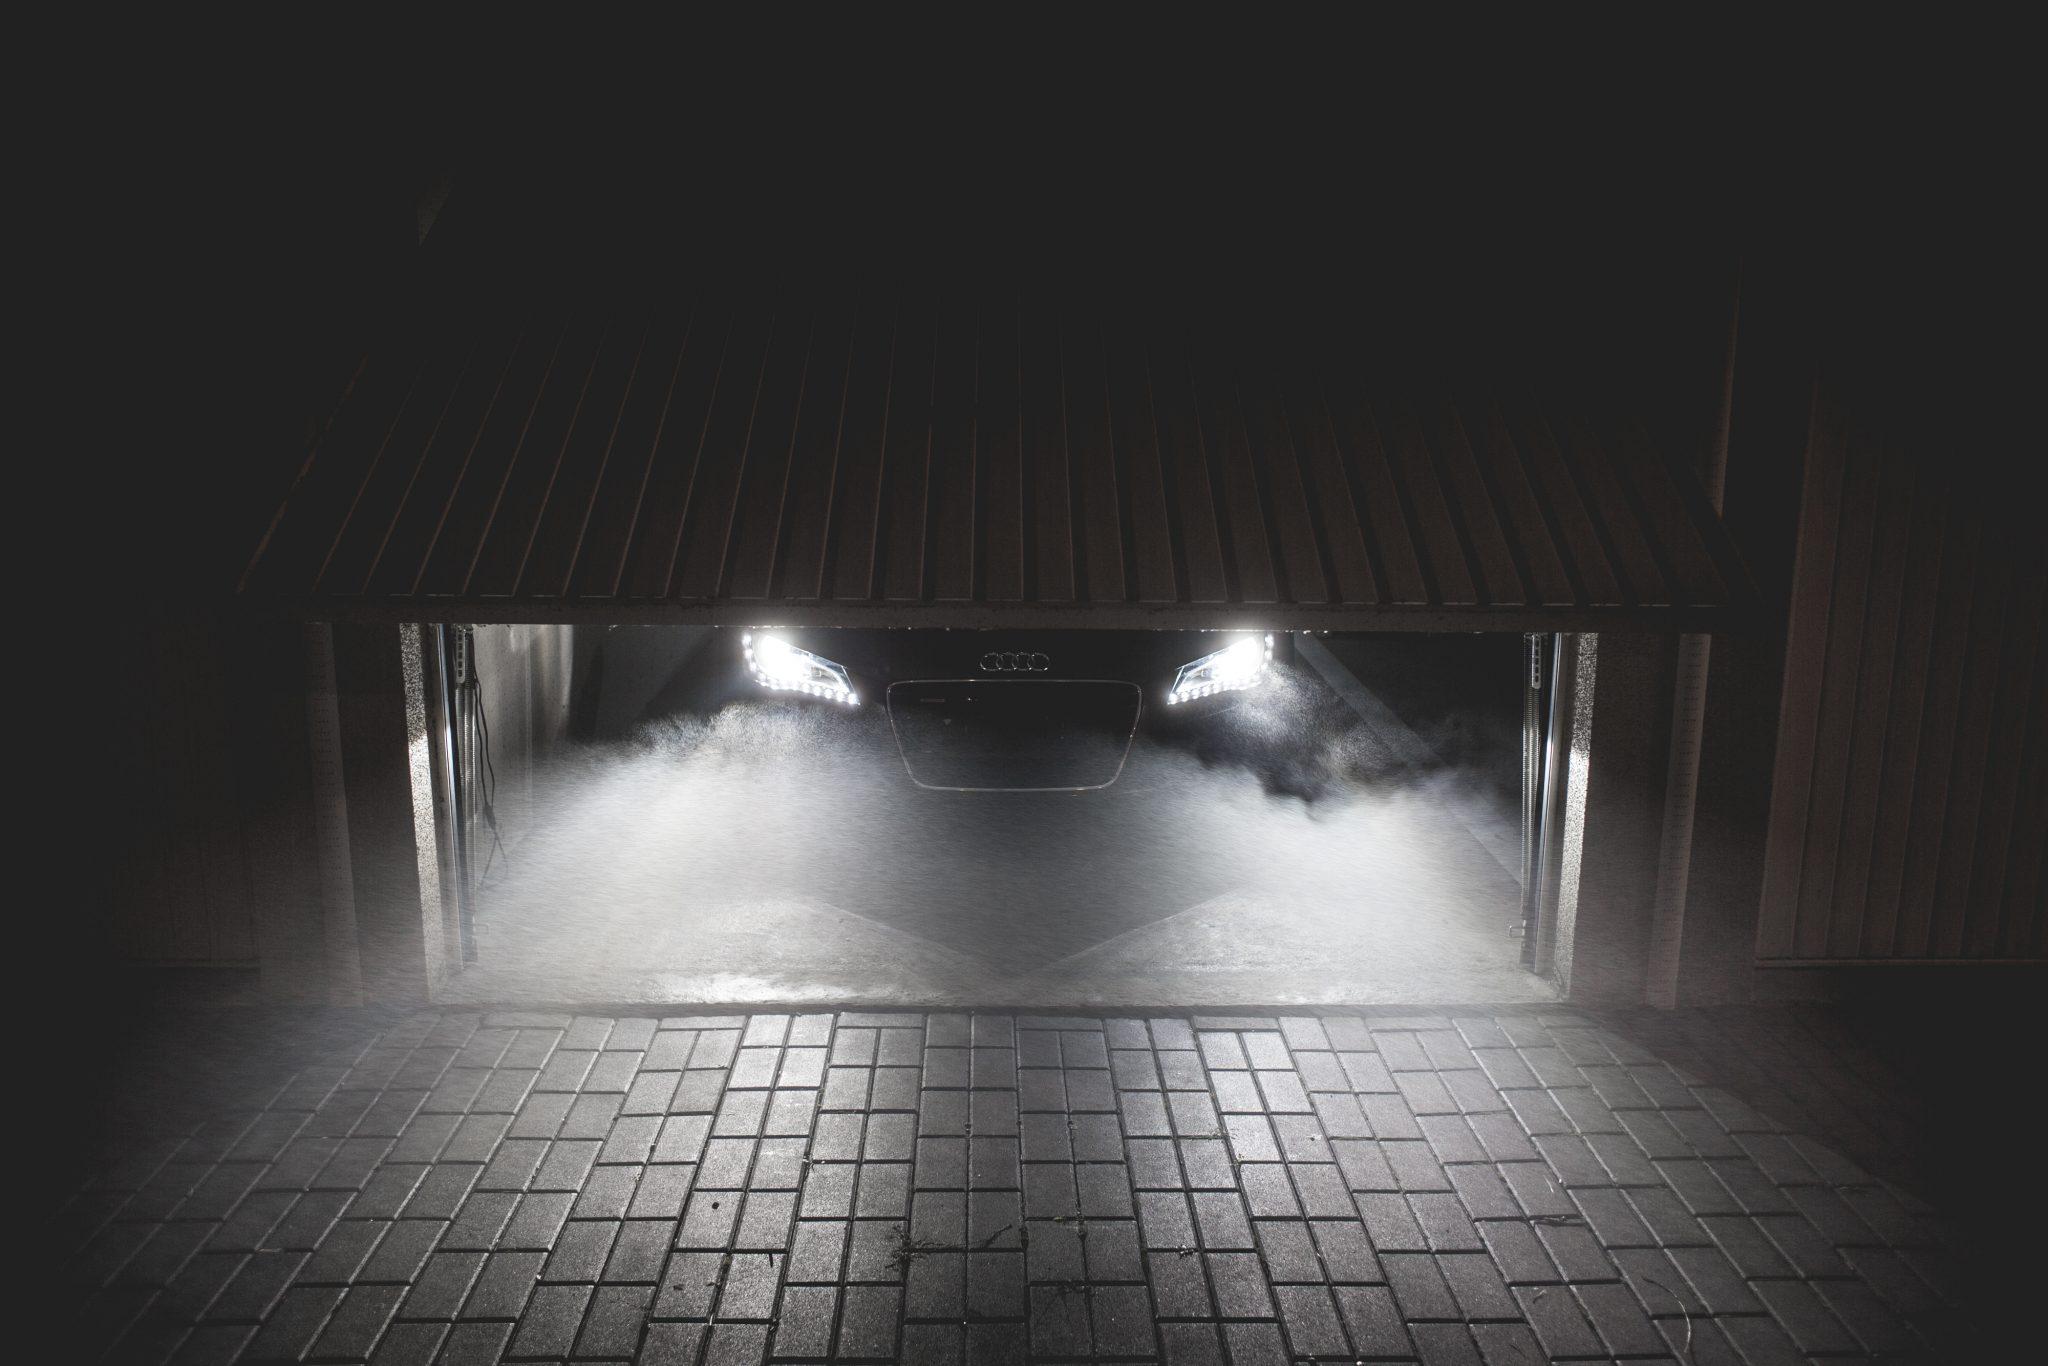 sportcar-waiting-in-garage-at-night-picjumbo-com